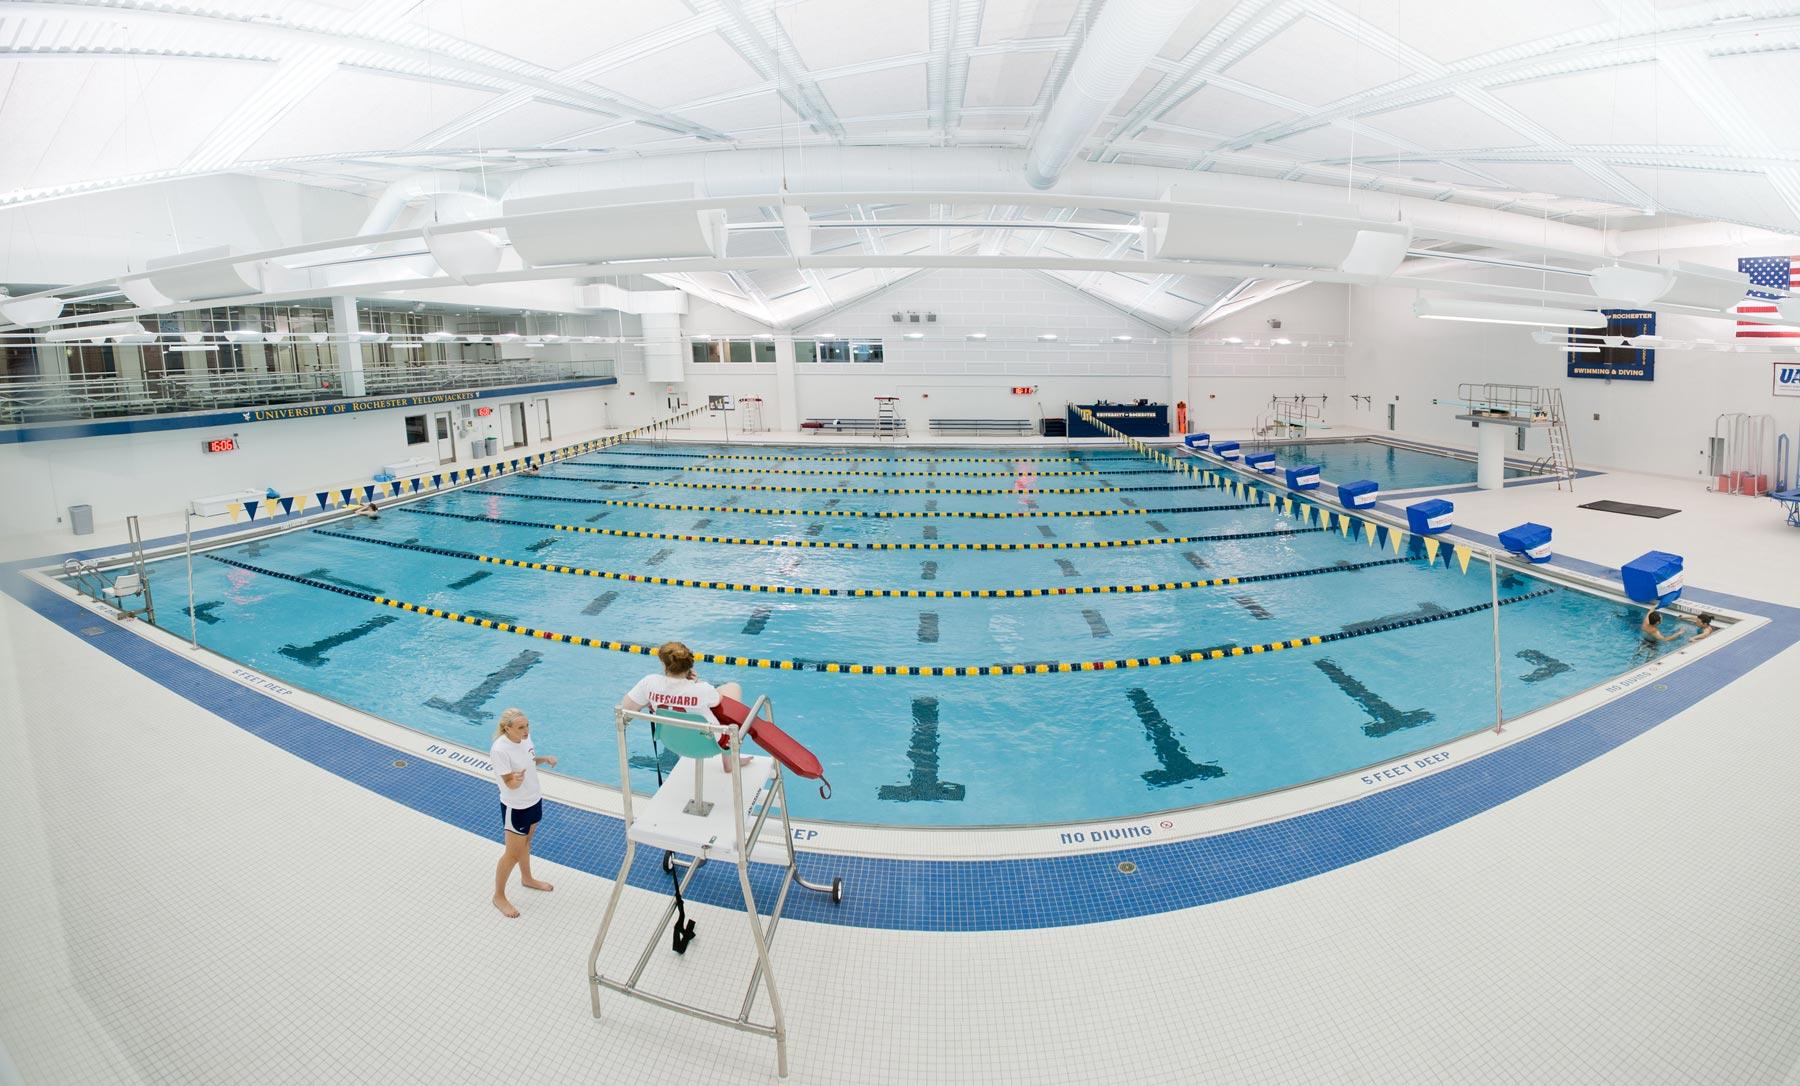 R pool  Speegle-Wilbraham Aquatic Center: University of Rochester